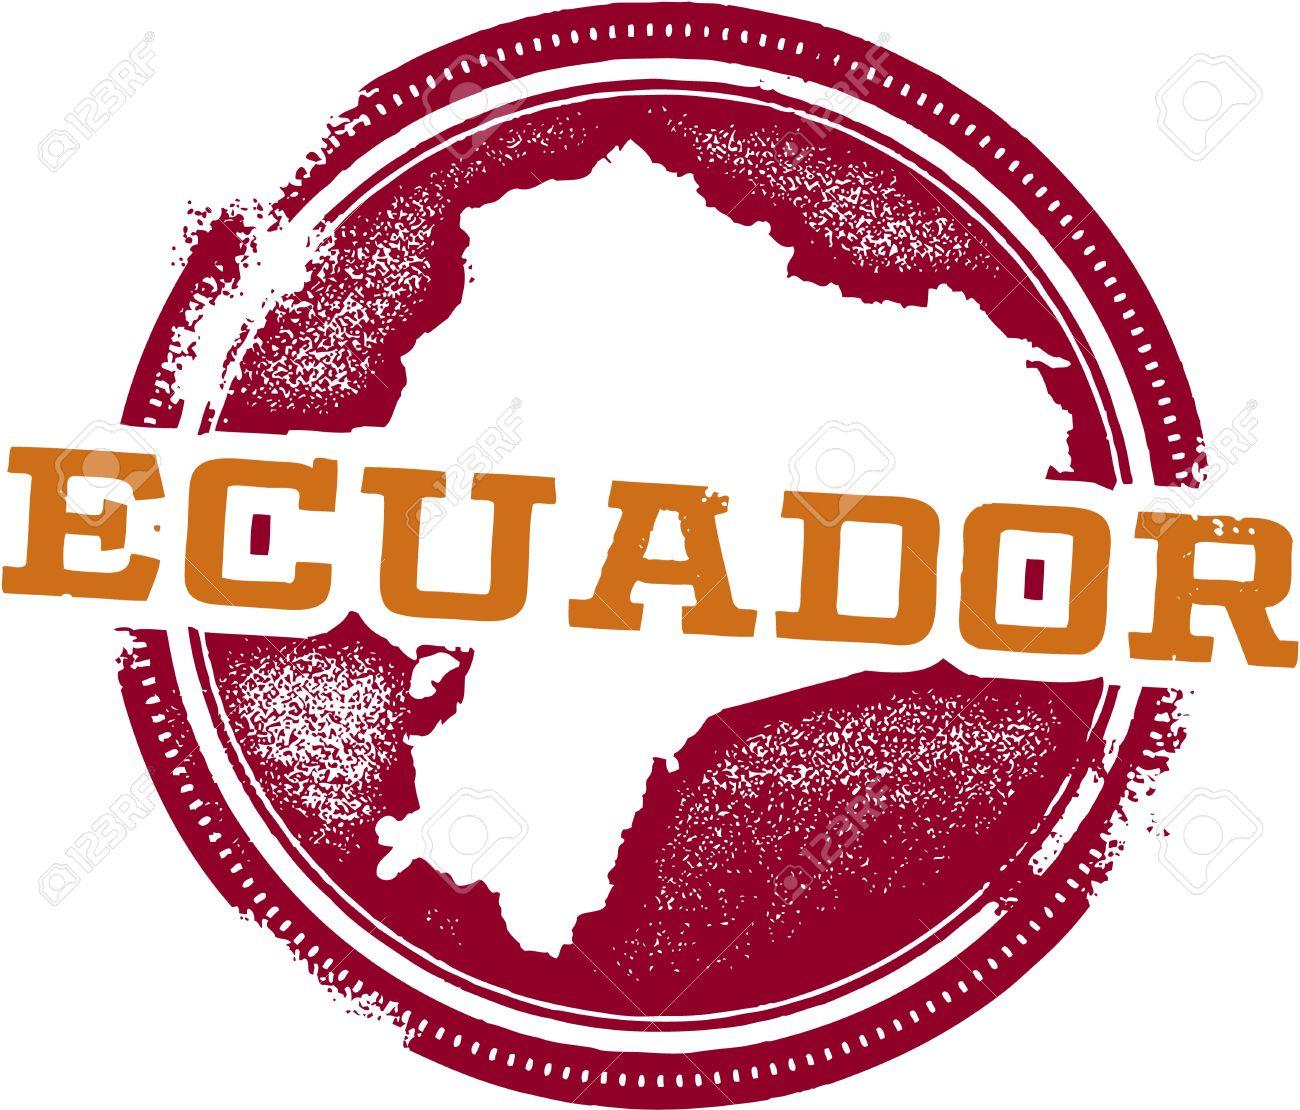 Ecuador South America Travel Stamp Stock Vector - 20341444